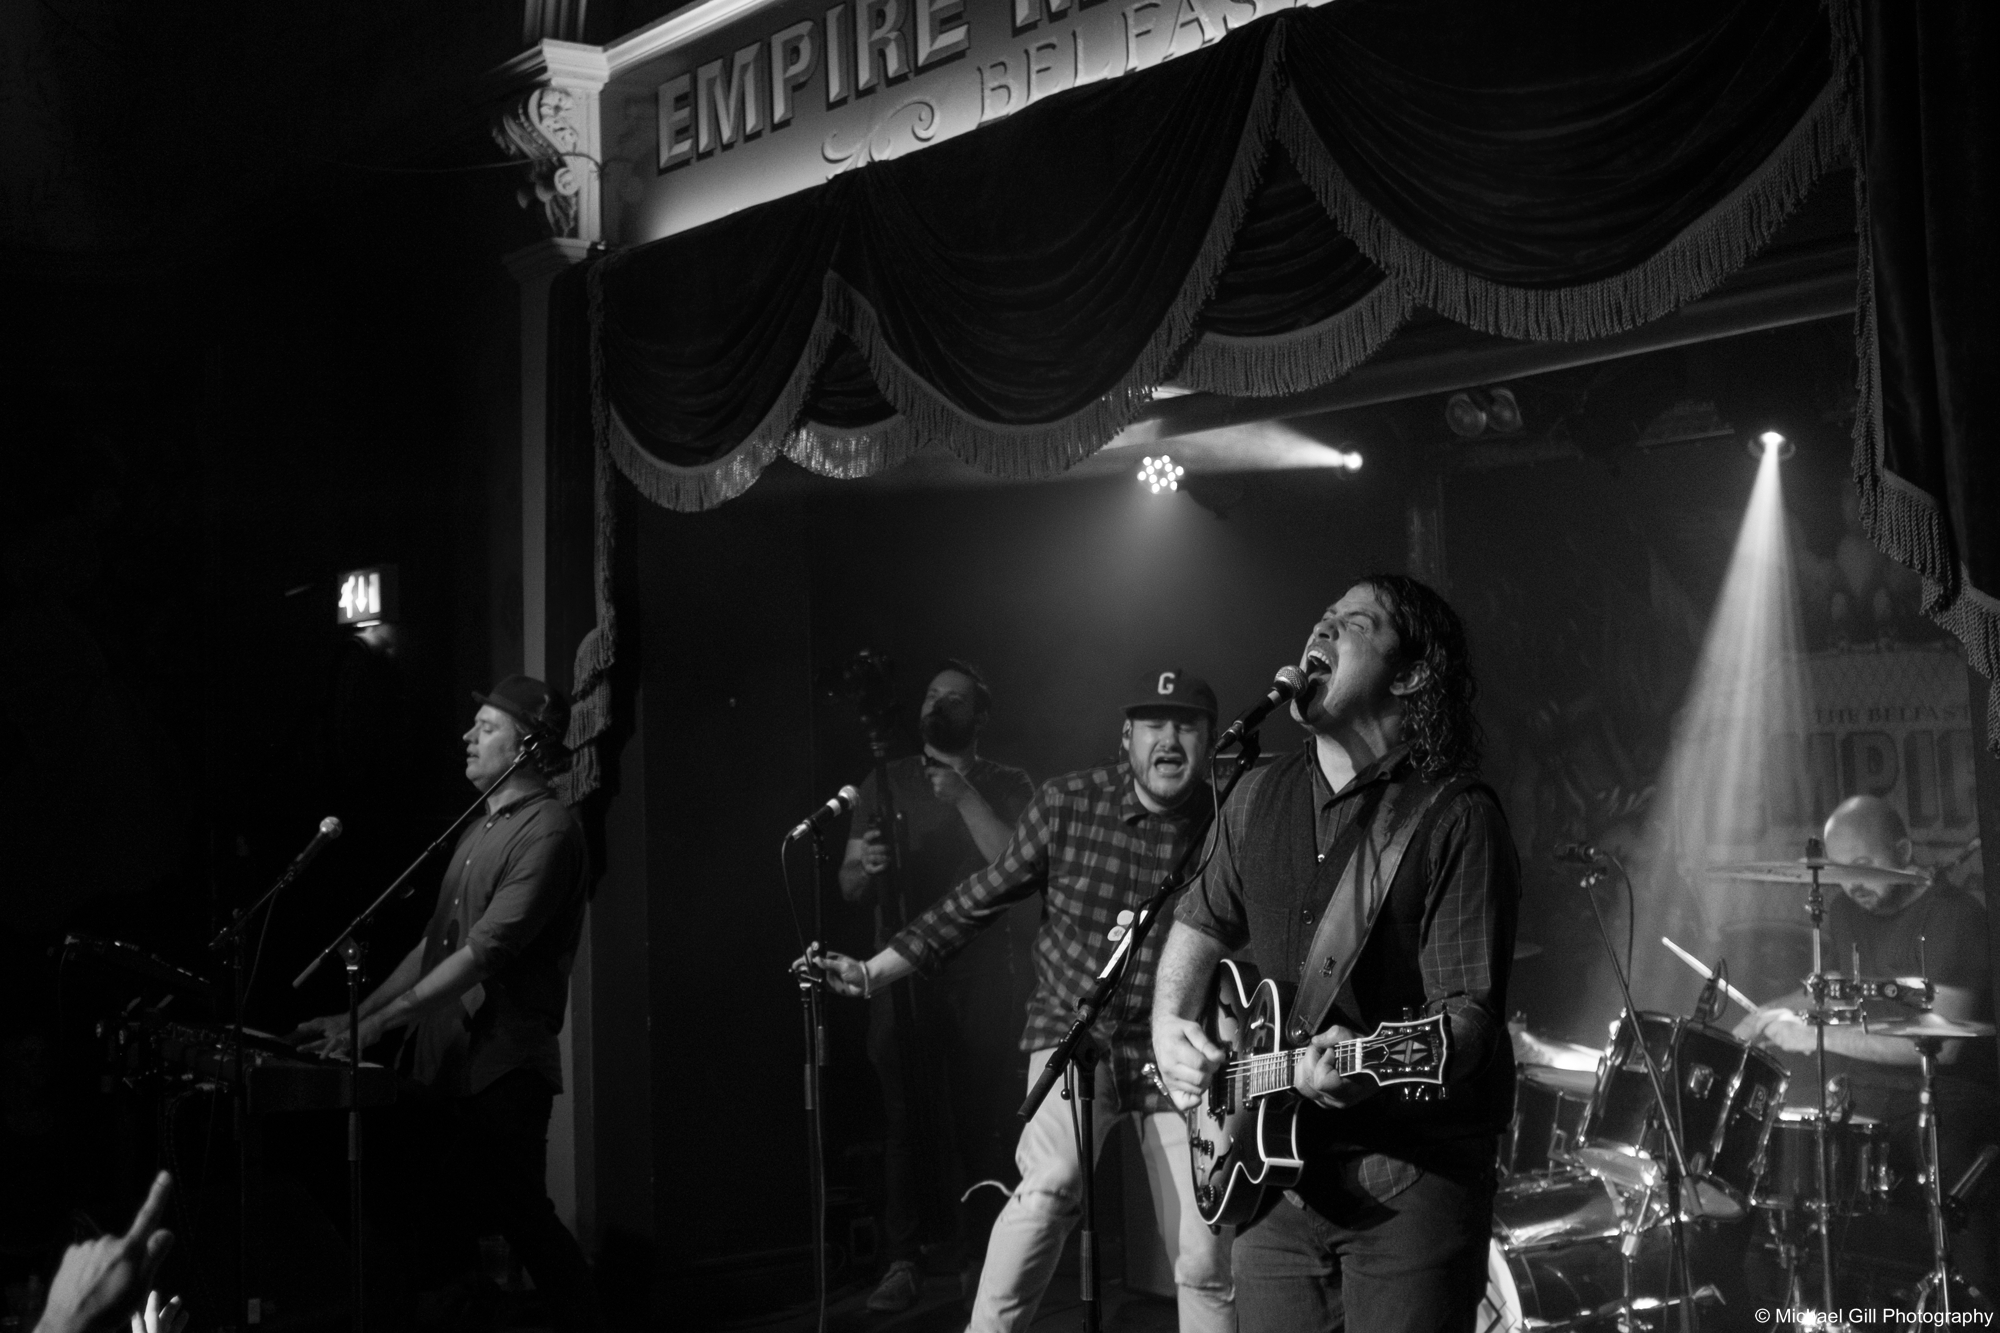 Michael_Gill_Photography_ Augustines_Empire_Belfast_4 (1).jpg